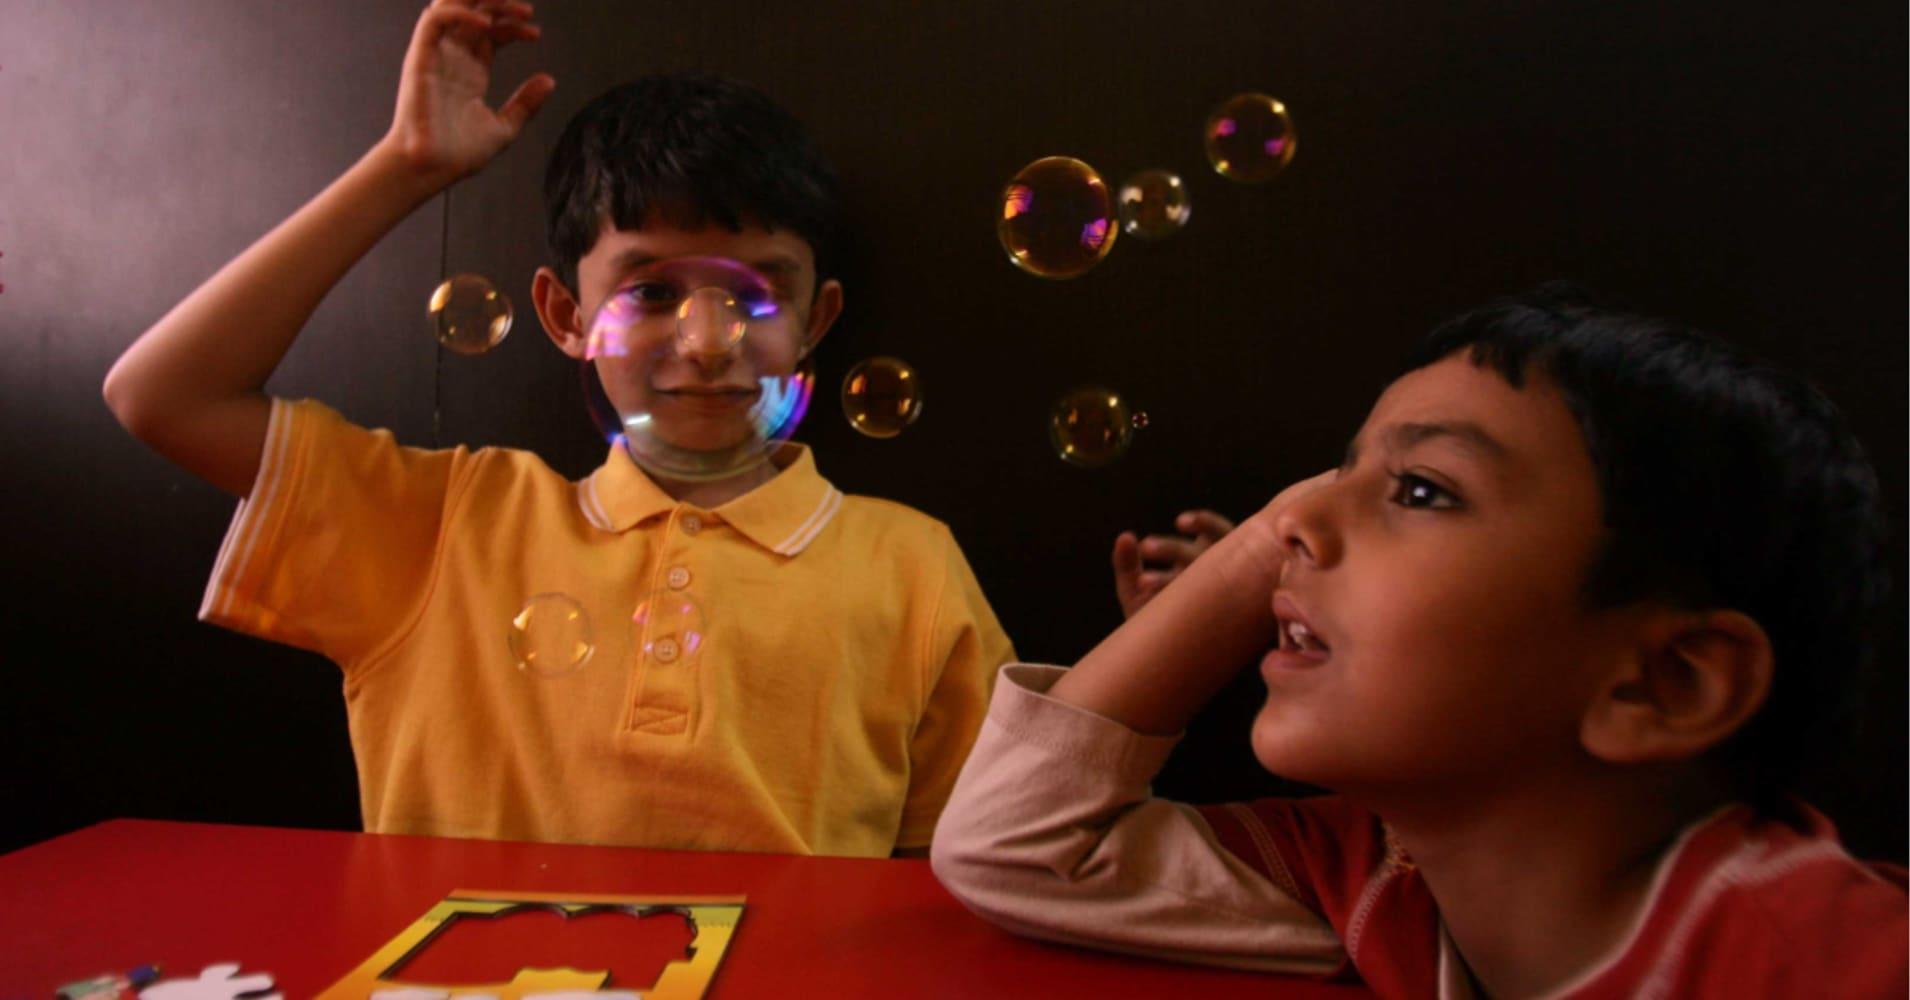 Autism At Center Of New Prime Time Tv >> Scientists Reveal Autism Risk Factors